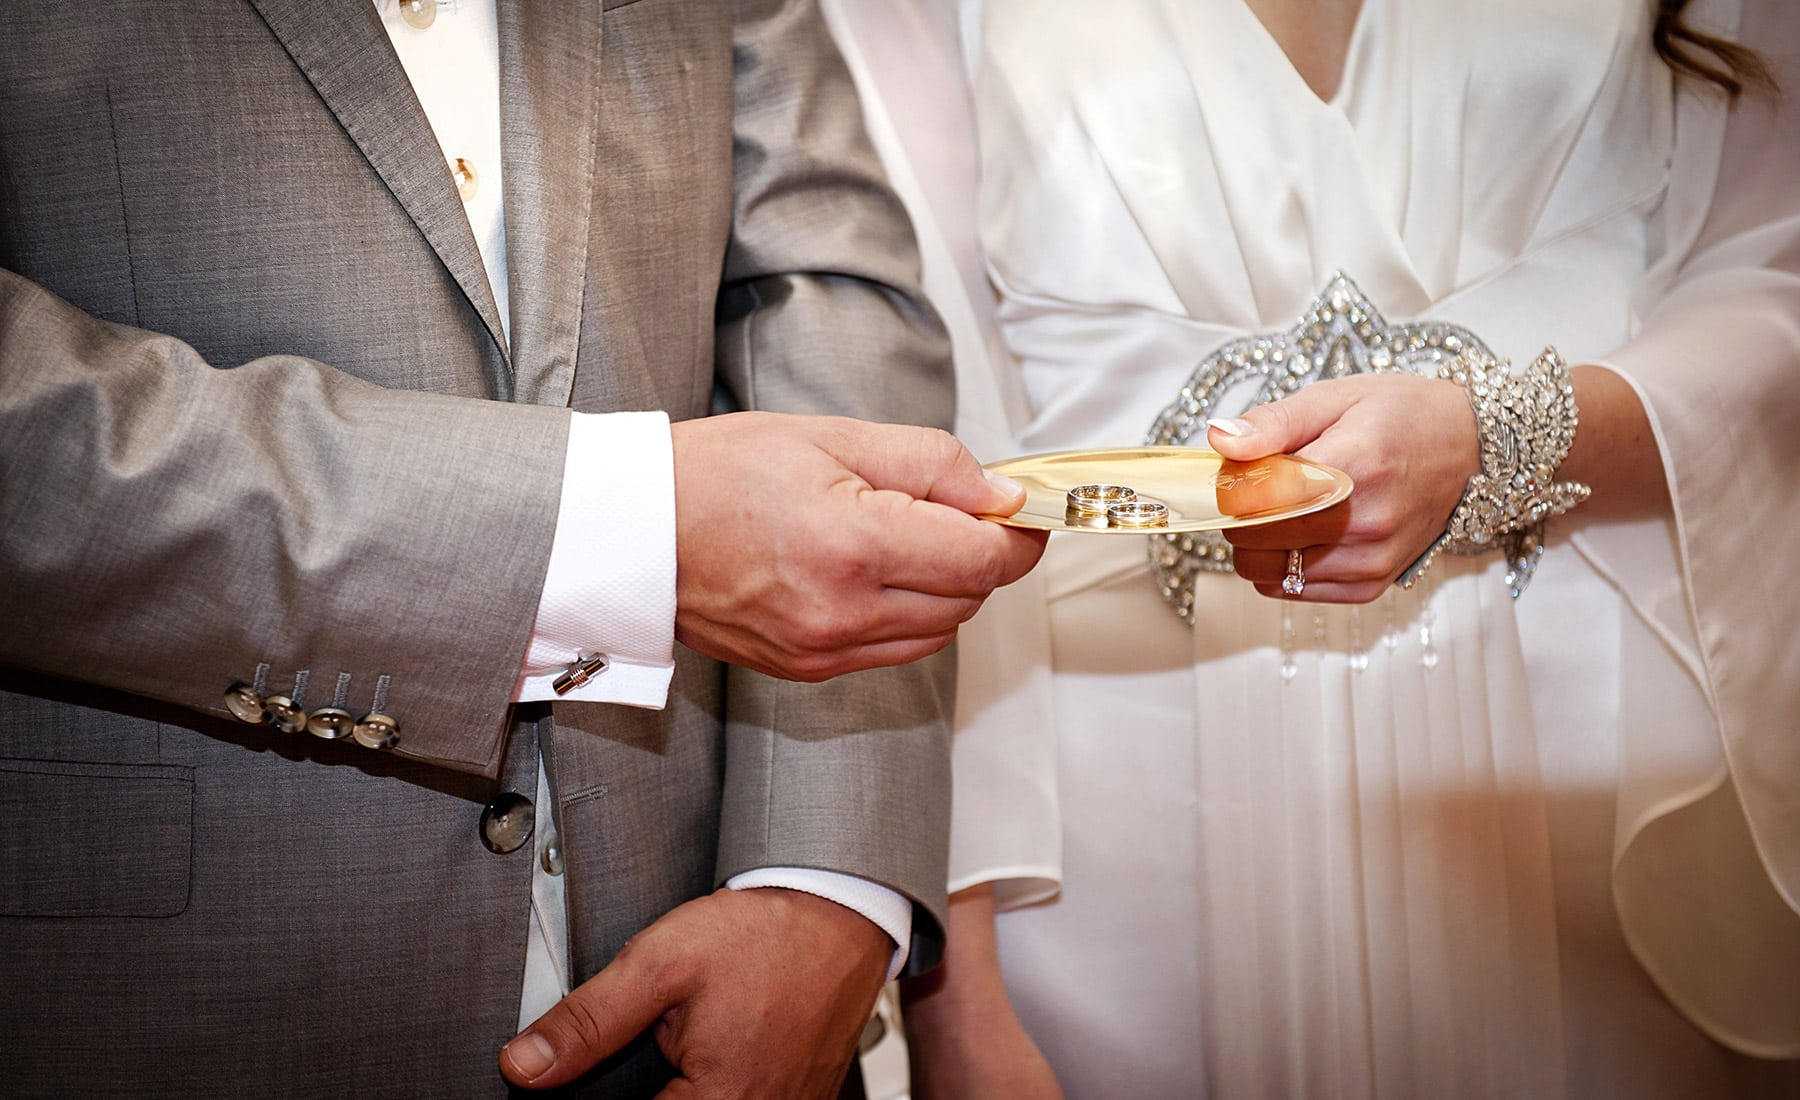 Oracion Matrimonio Catolico : Espiritualidad del matrimonio por tu matrimonio